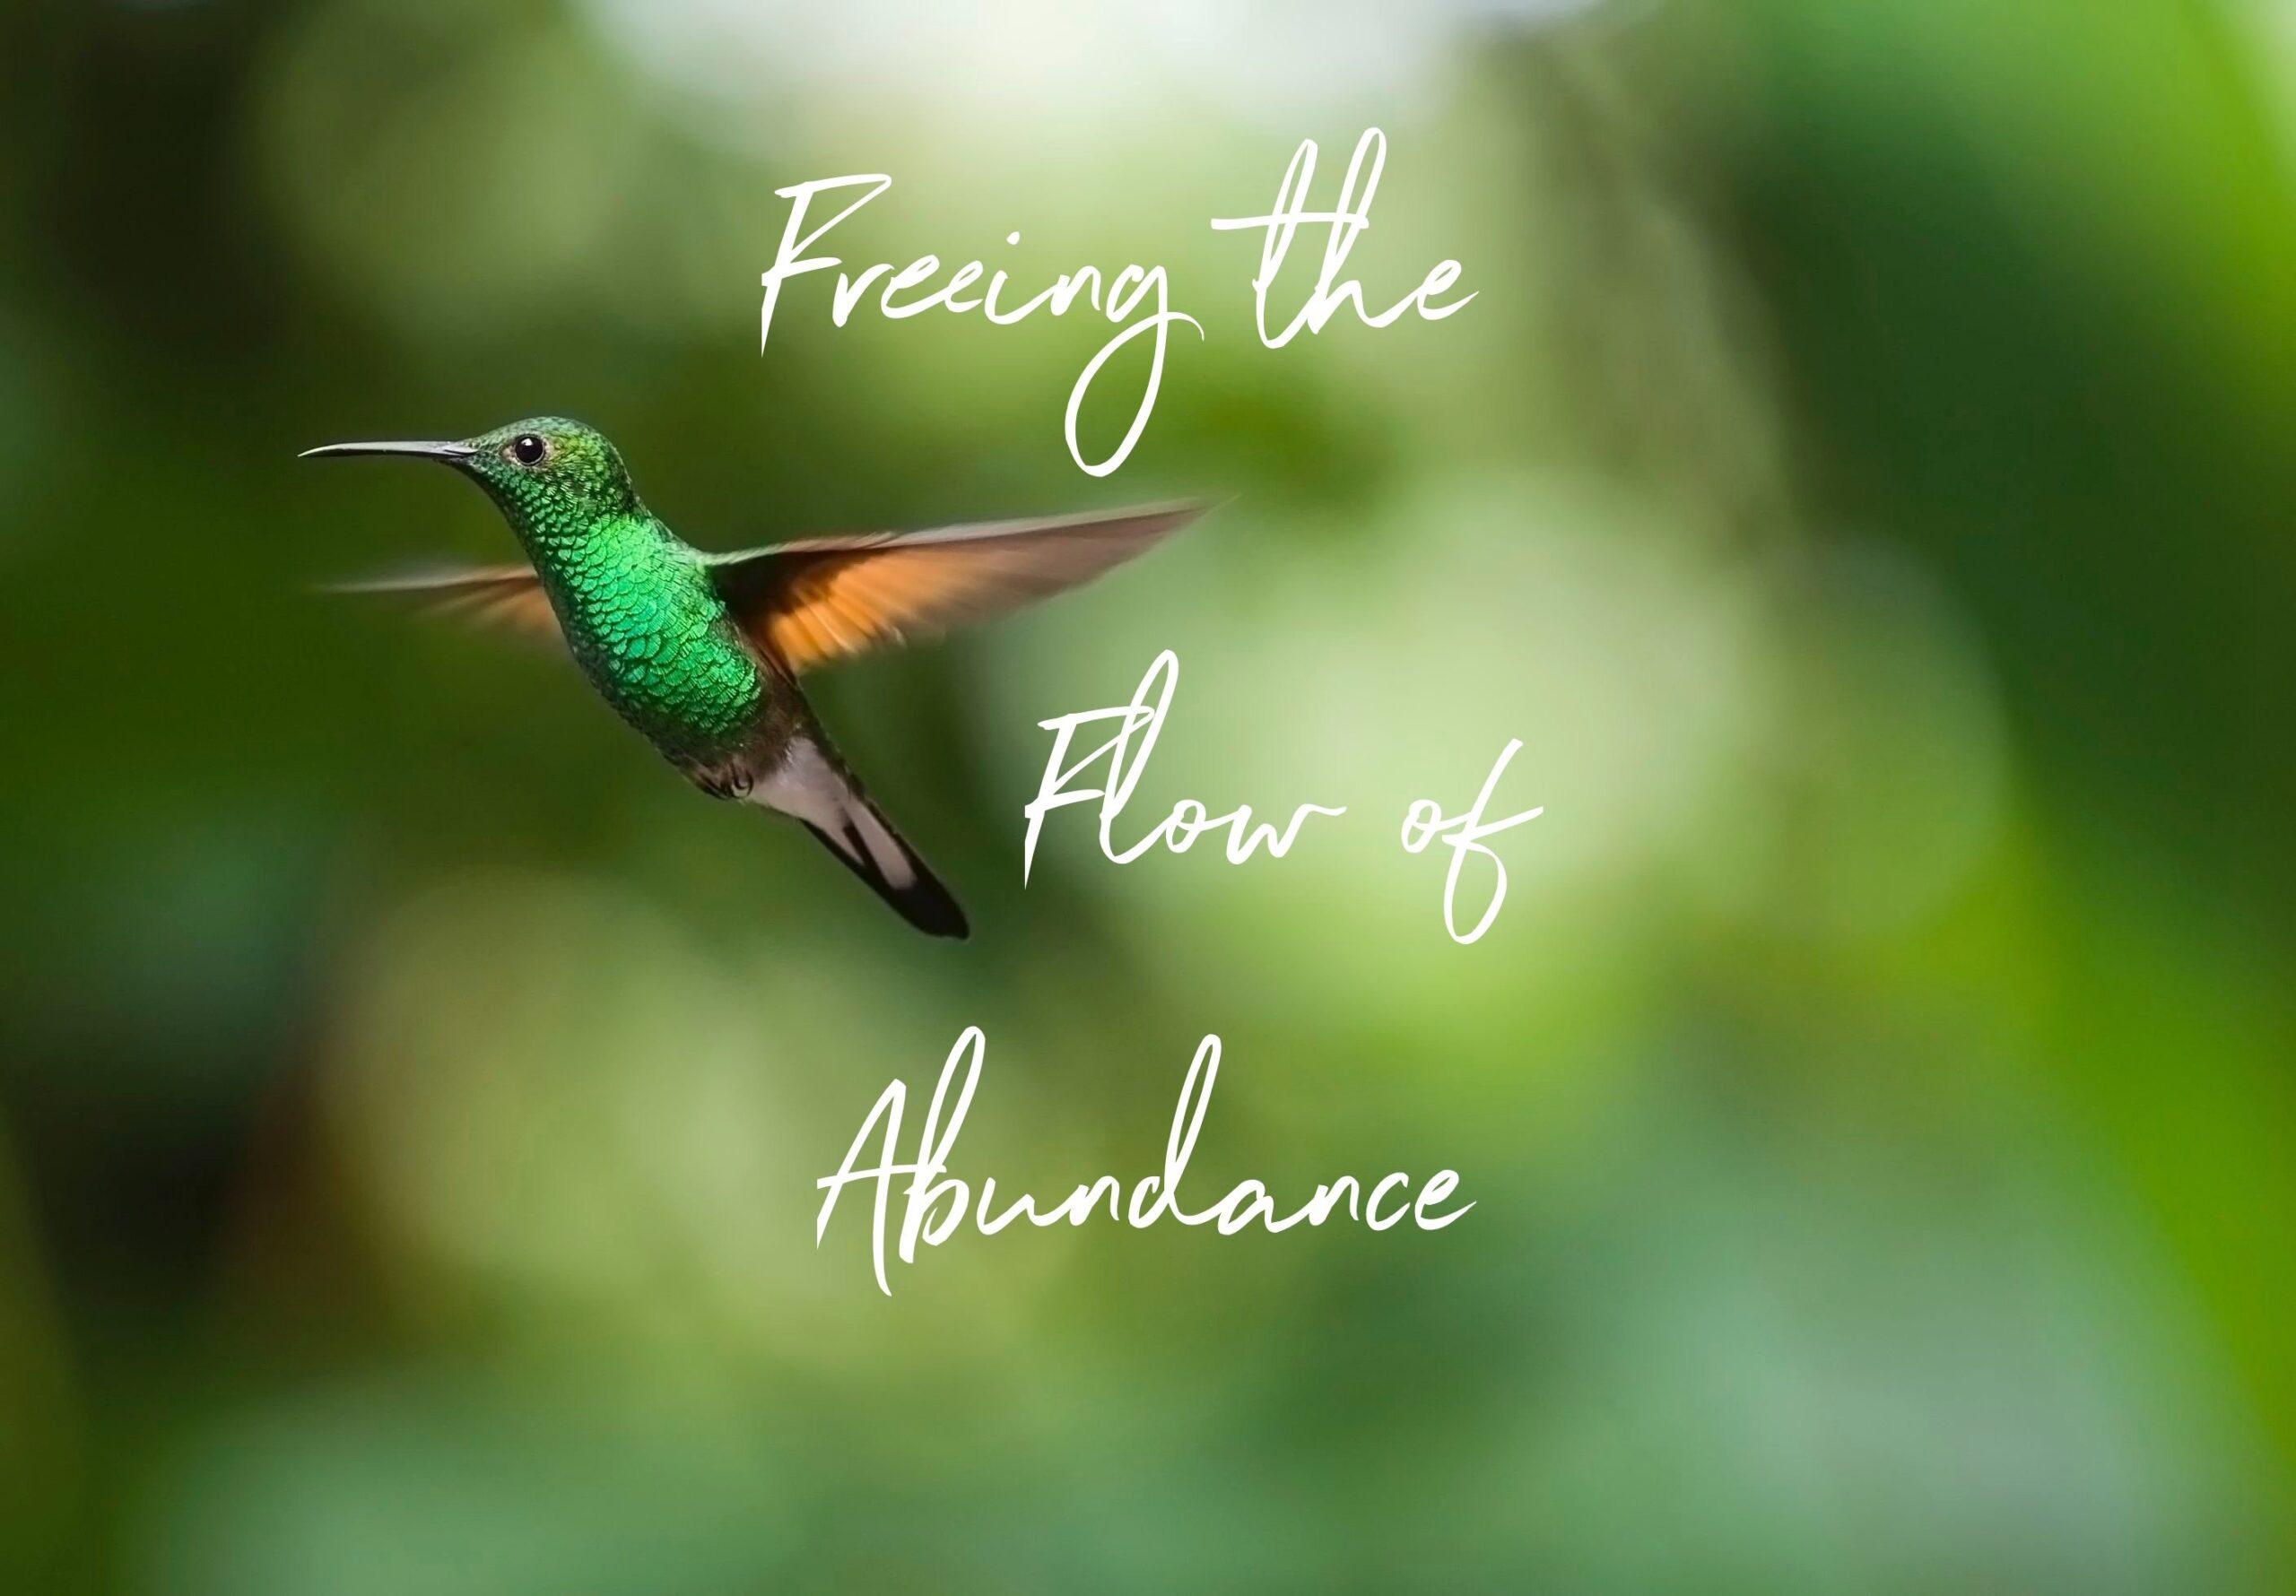 Freeing the flow of abundance